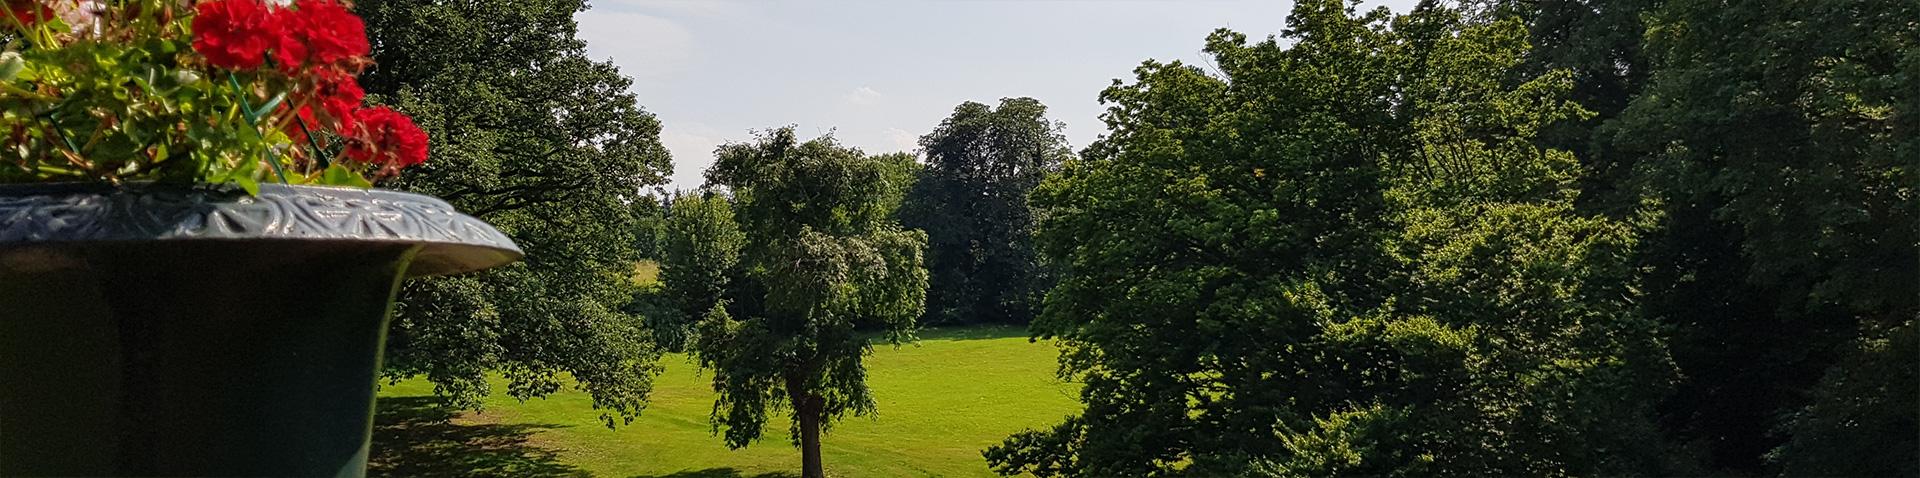 Schlosspark - Schloss Proschwitz